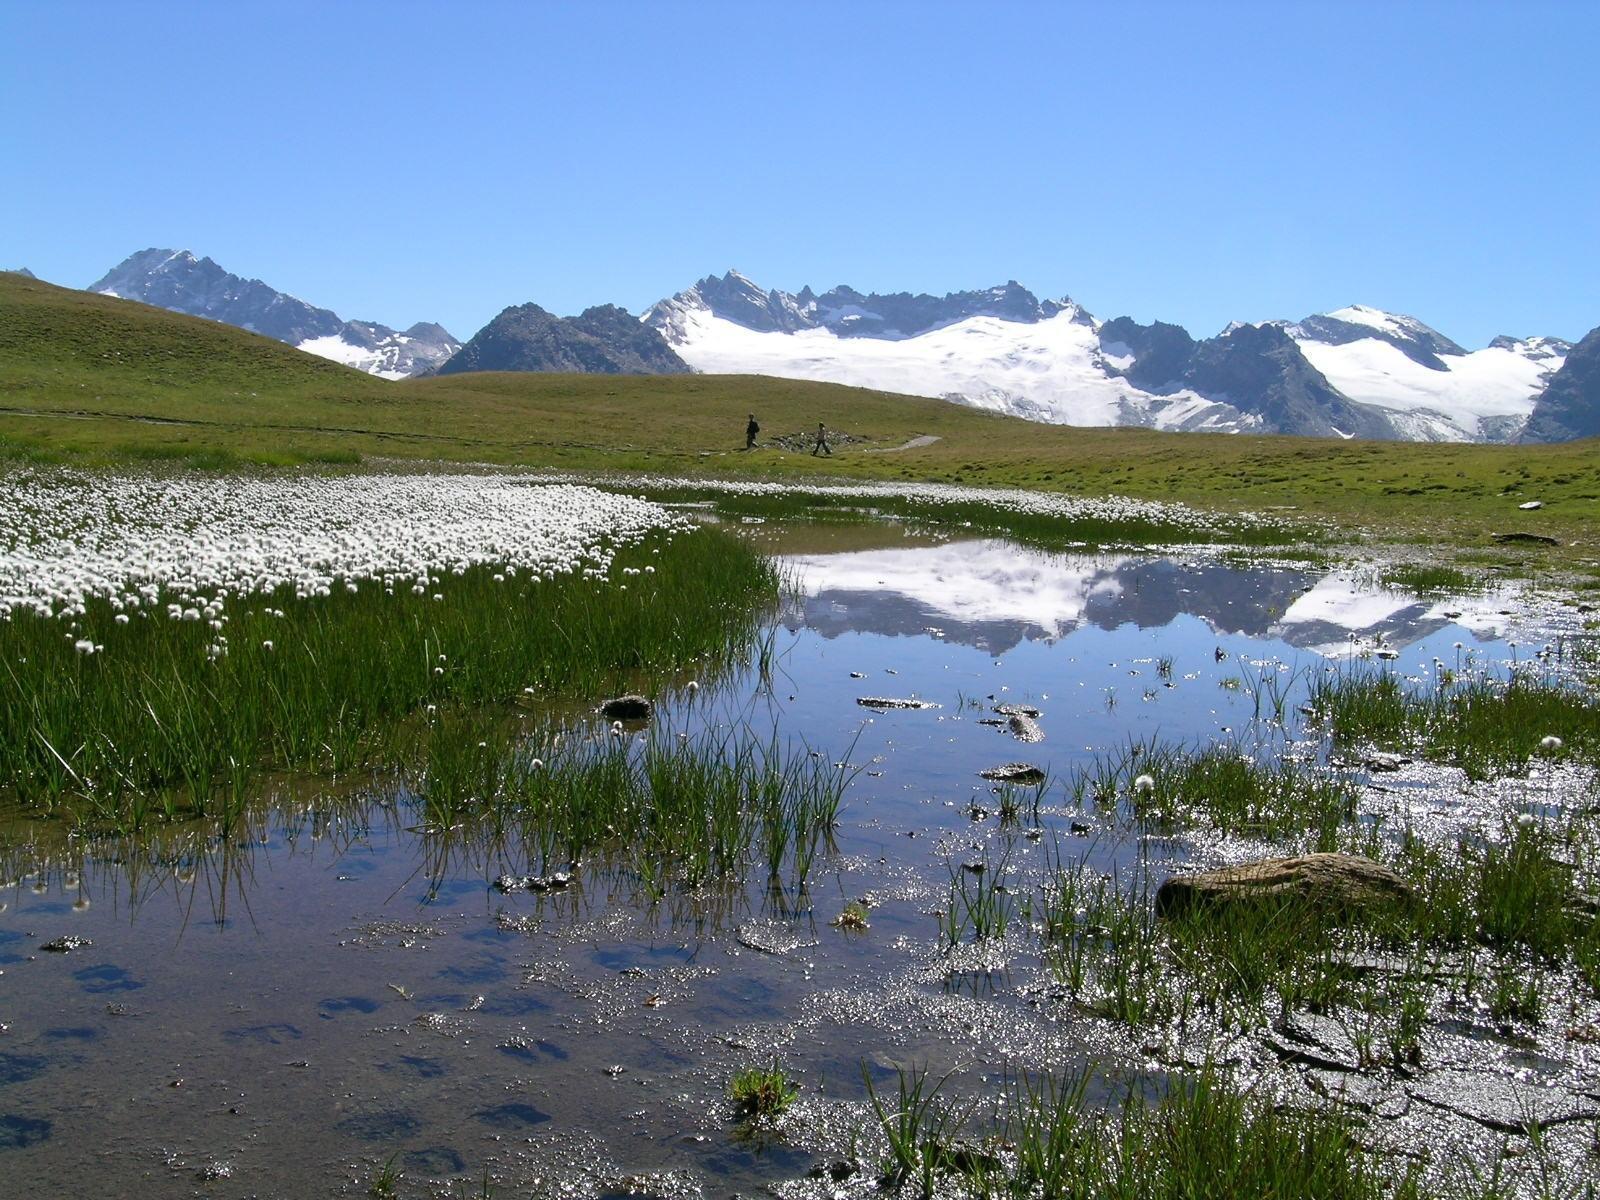 Rando vanoise lanslebourg mont cenis 73480 savoie 73 for Haute maurienne